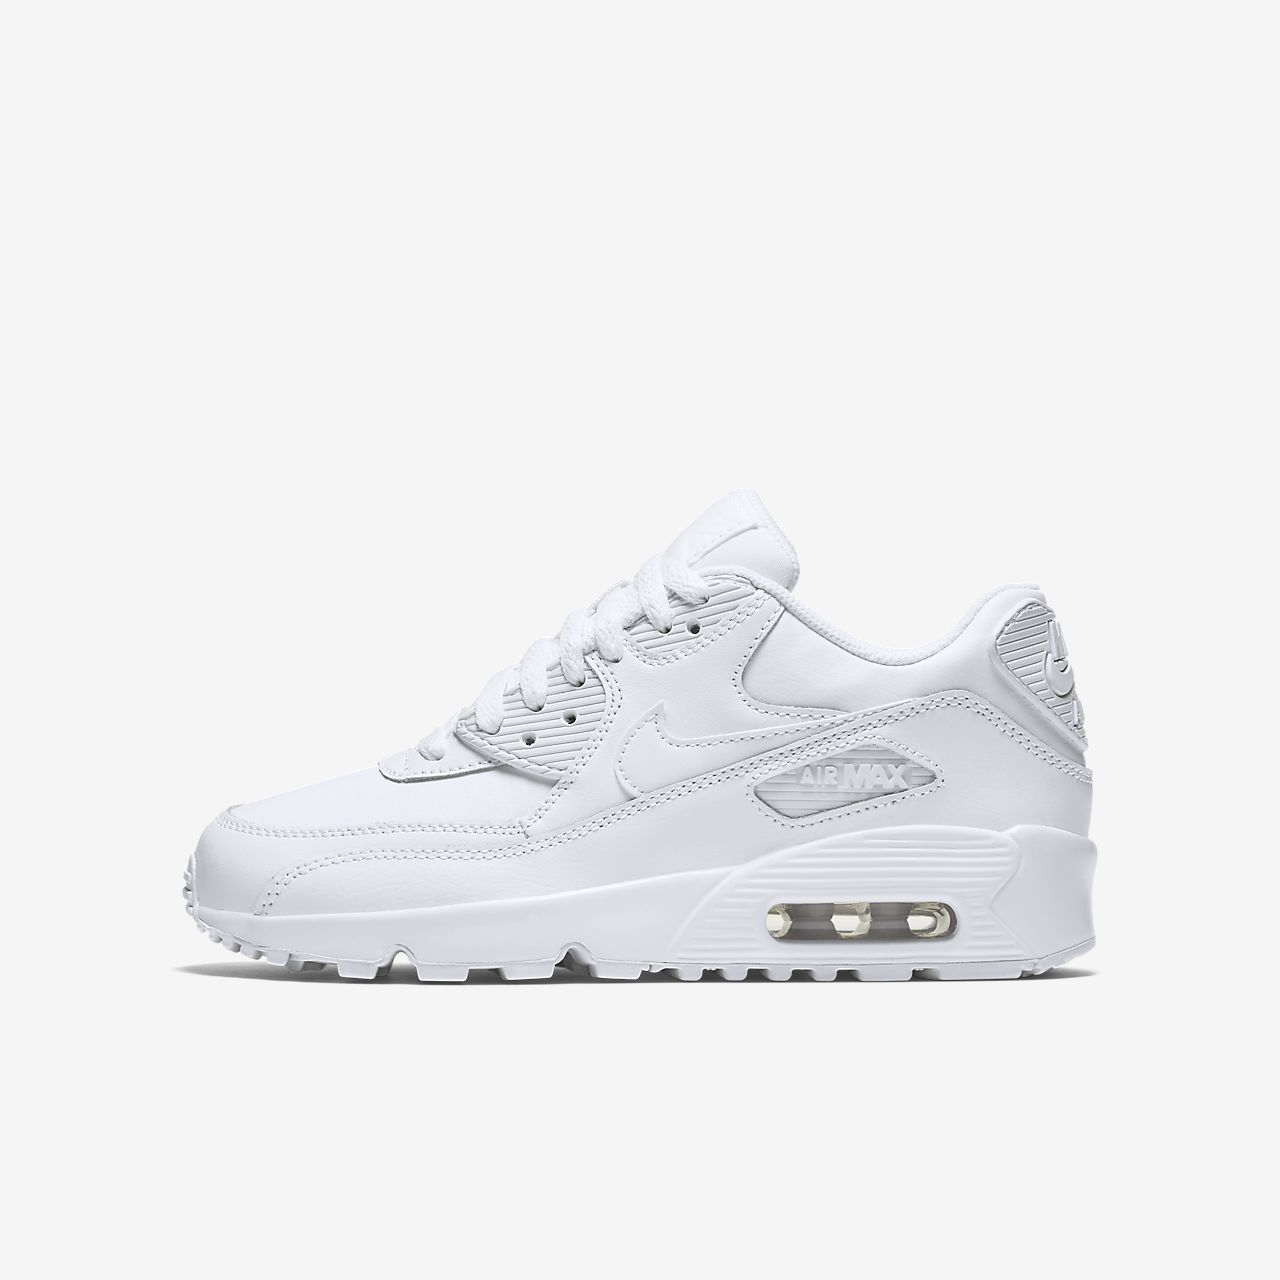 buy online 9c56f 6e865 ... Nike Air Max 90 Leather Sabatilles - Nena